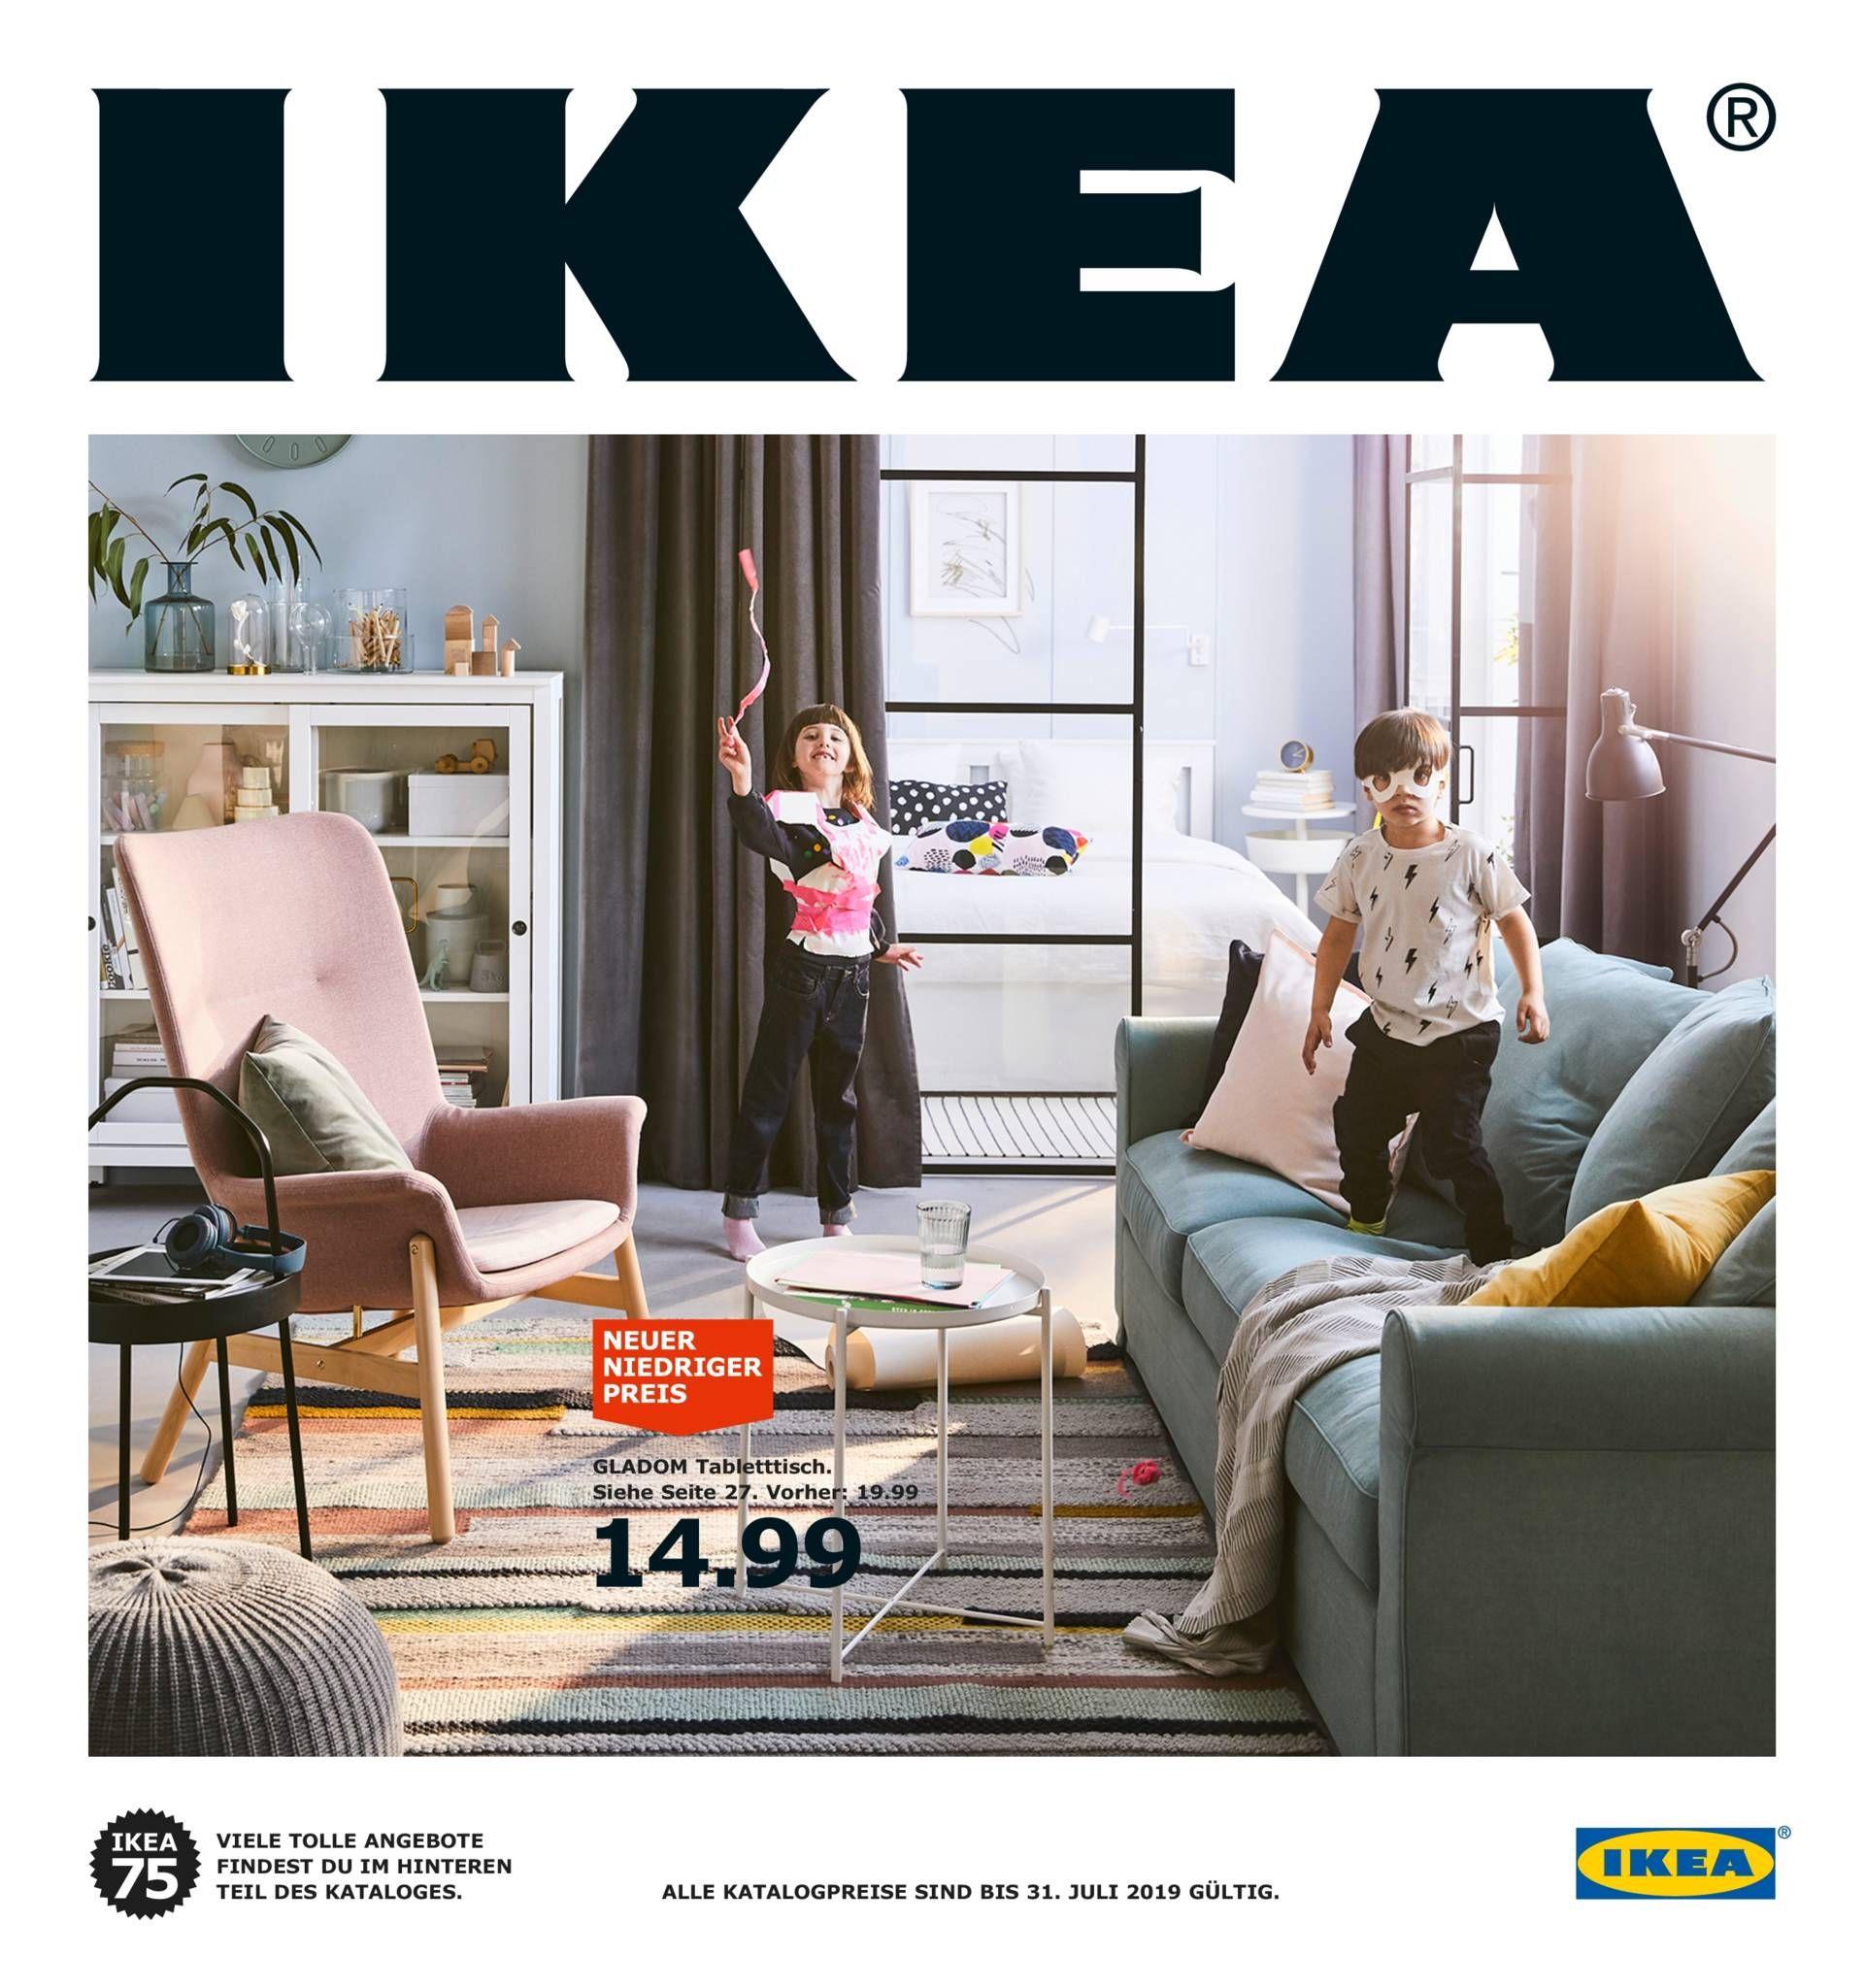 IKEA Katalog 2019   IKEA Katalog 2019